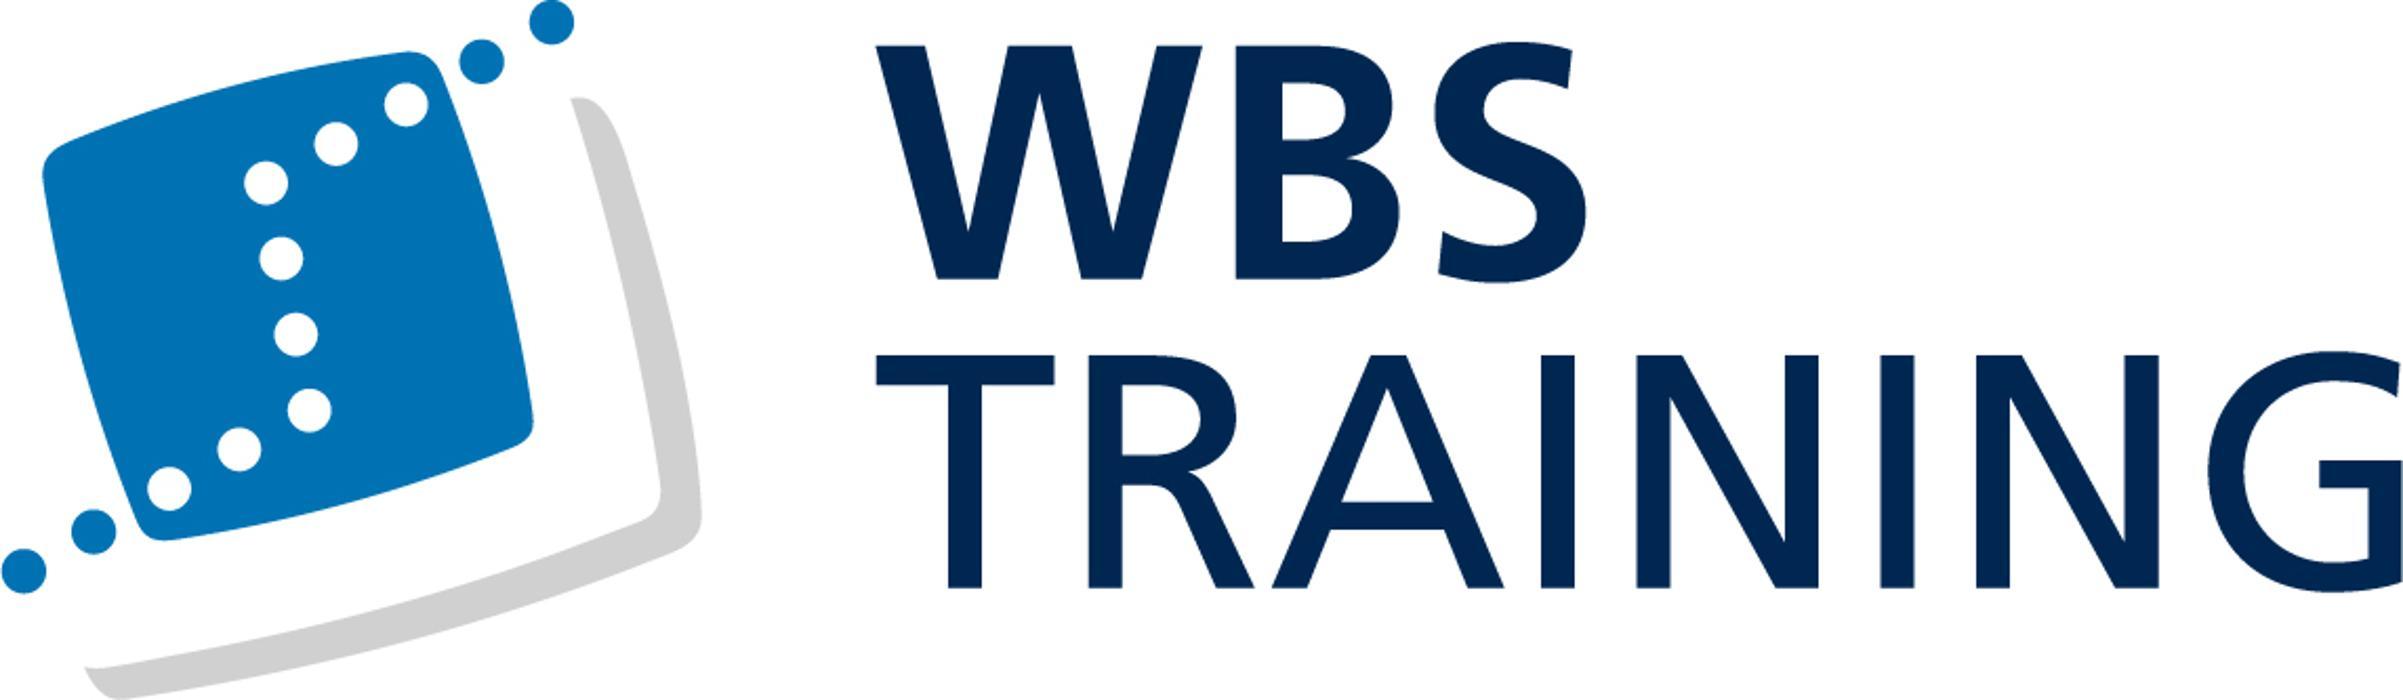 Bild zu WBS TRAINING Offenbach am Main in Offenbach am Main